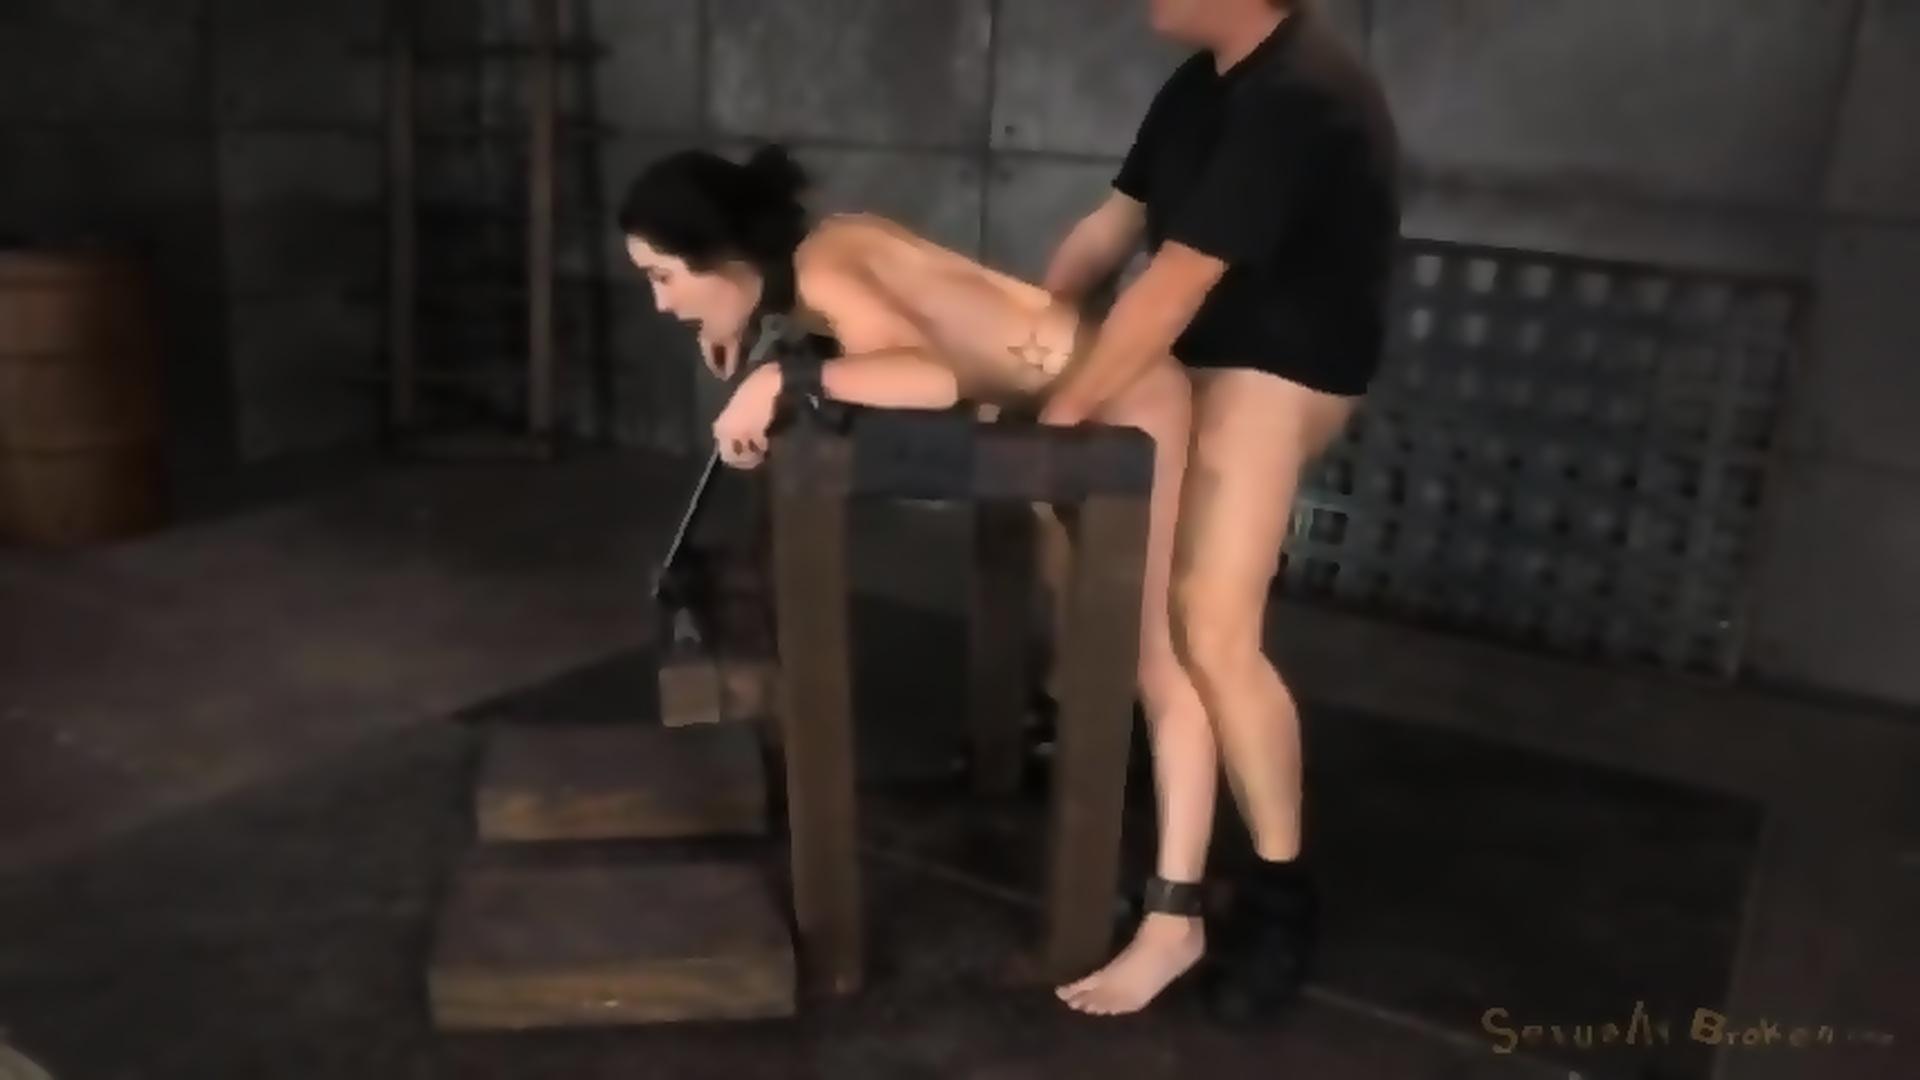 Free sexually broken compilation porn video porn image gallery scene